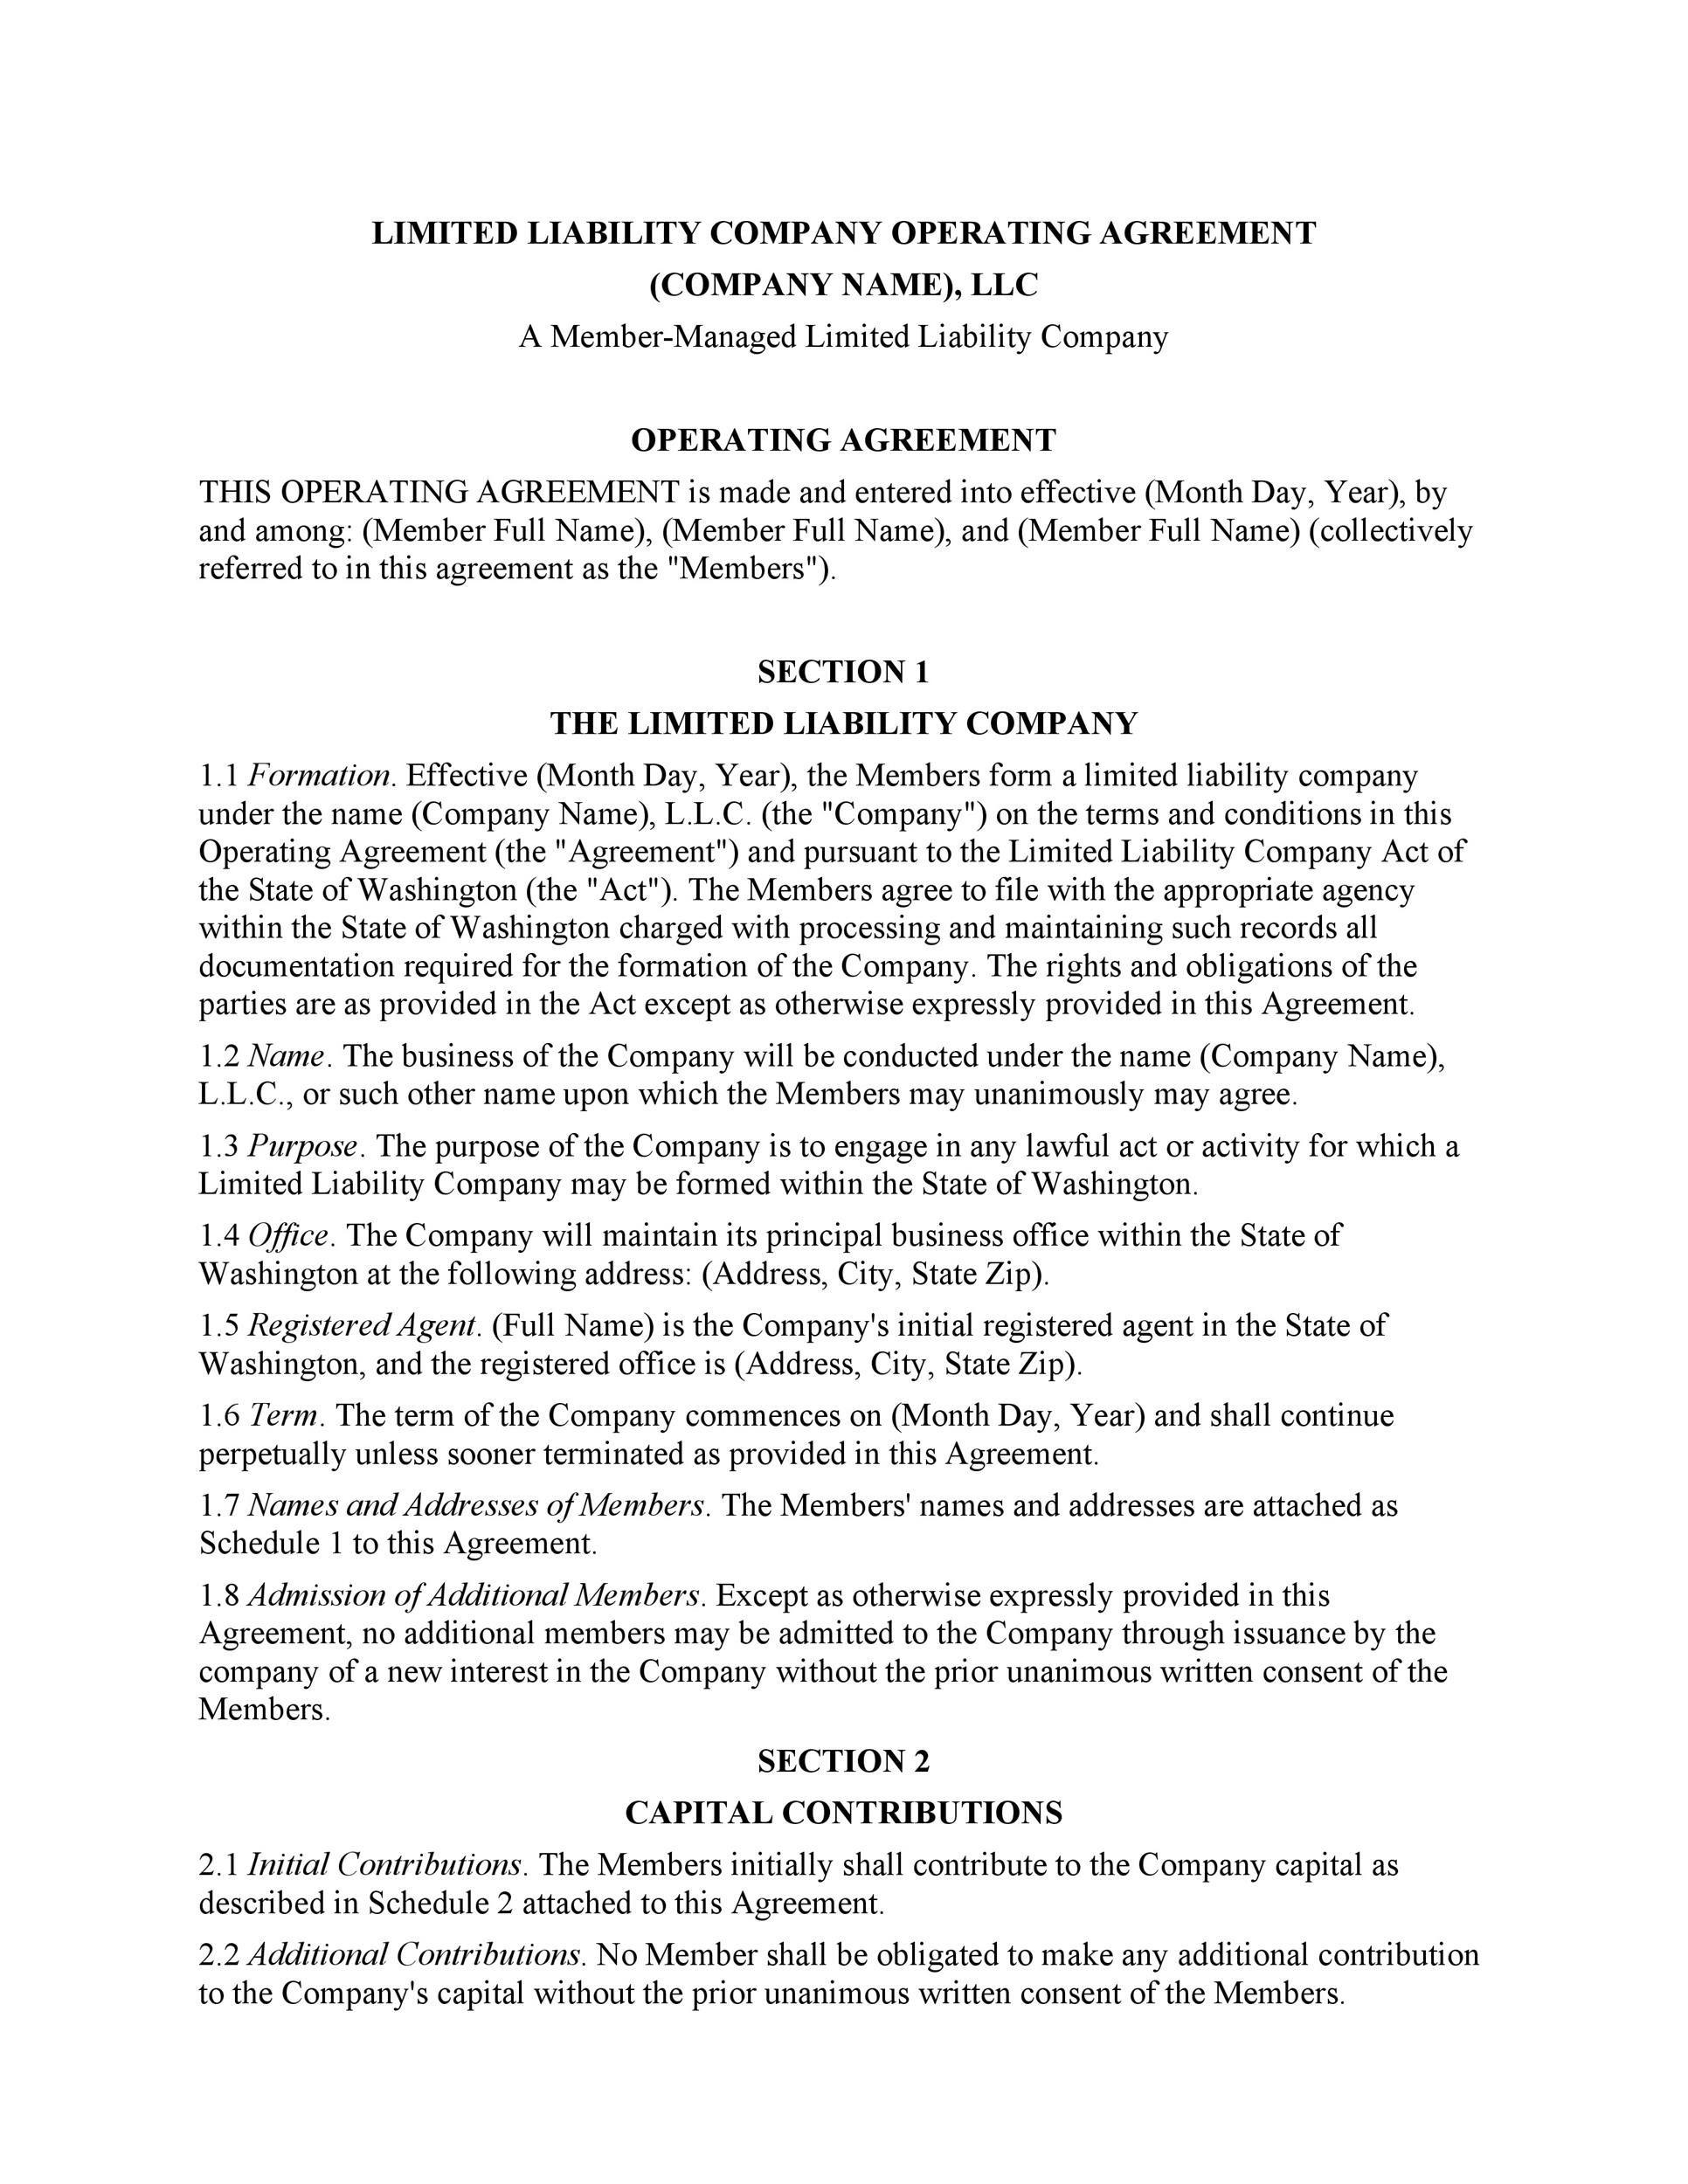 007 Singular Operating Agreement Template For Llc High Resolution  Form Florida TexaFull